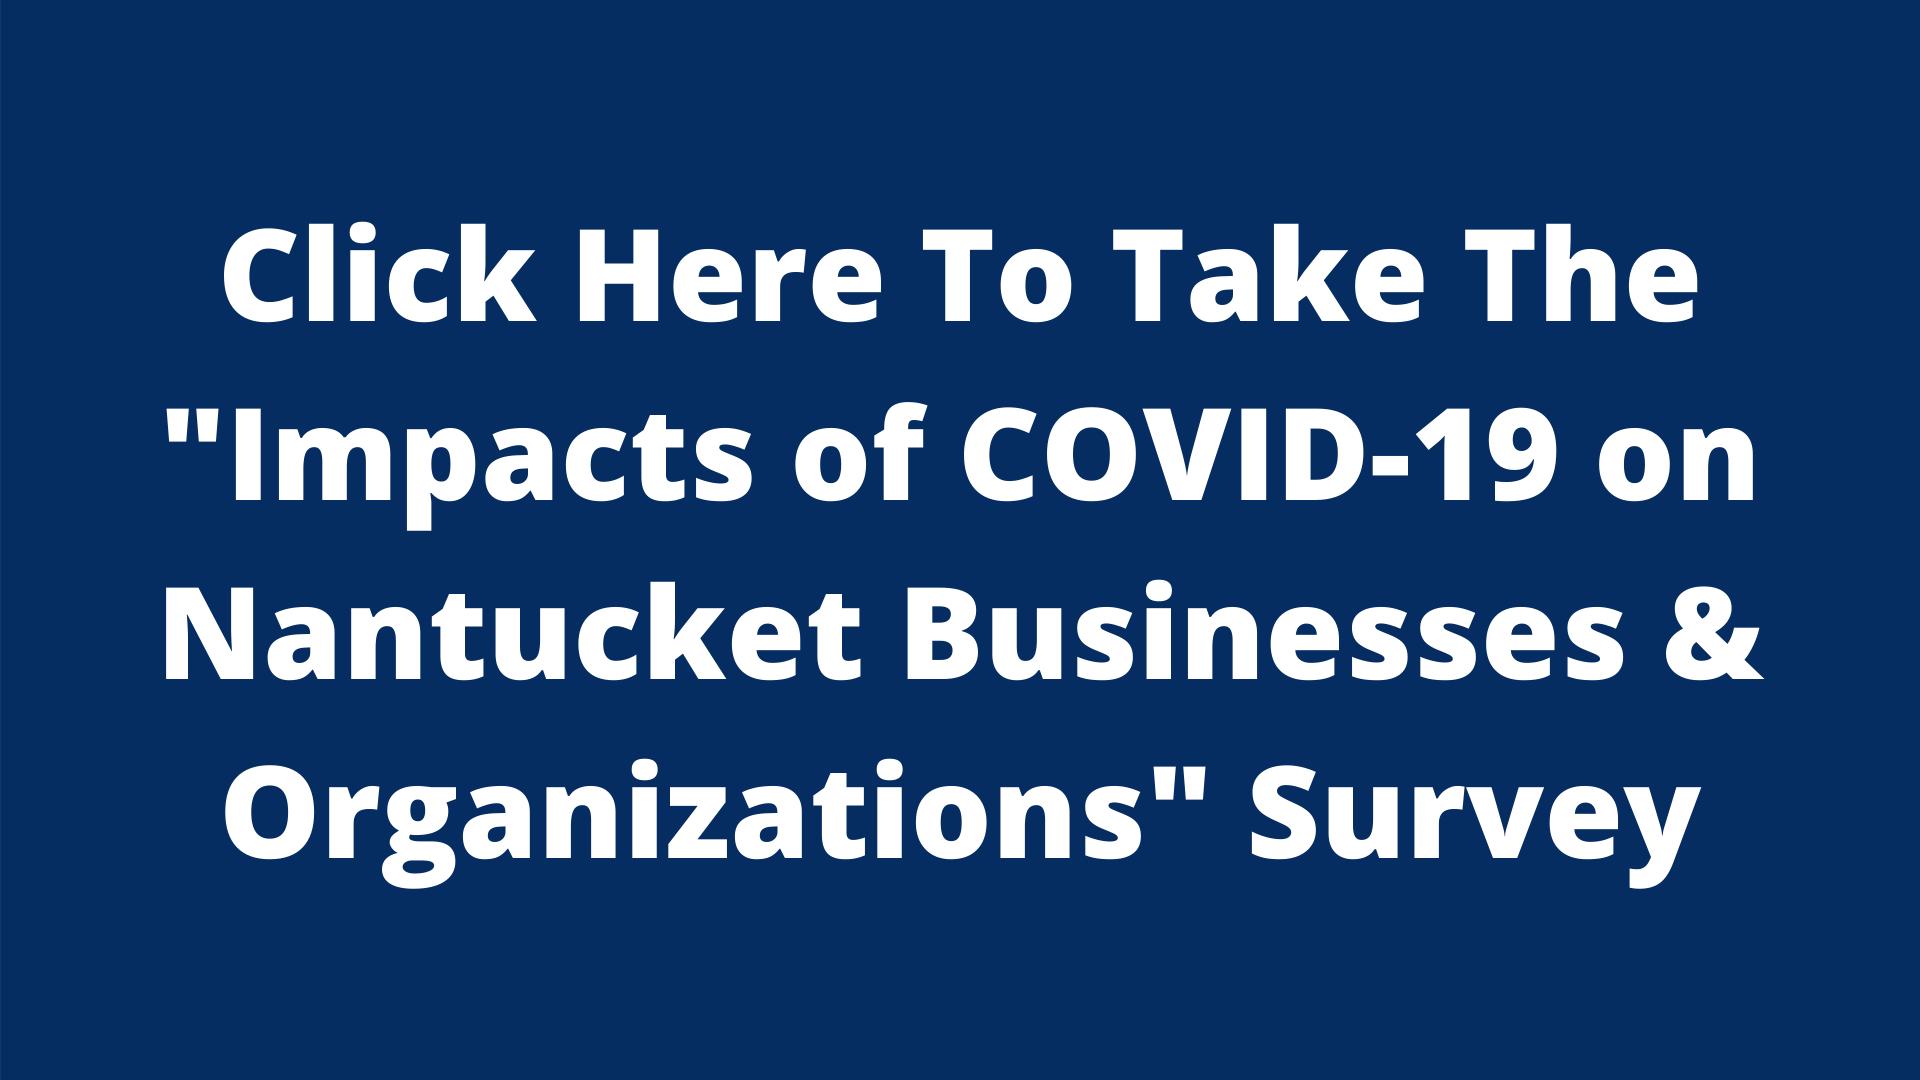 Nantucket COVID-19 Business & Organizations Survey